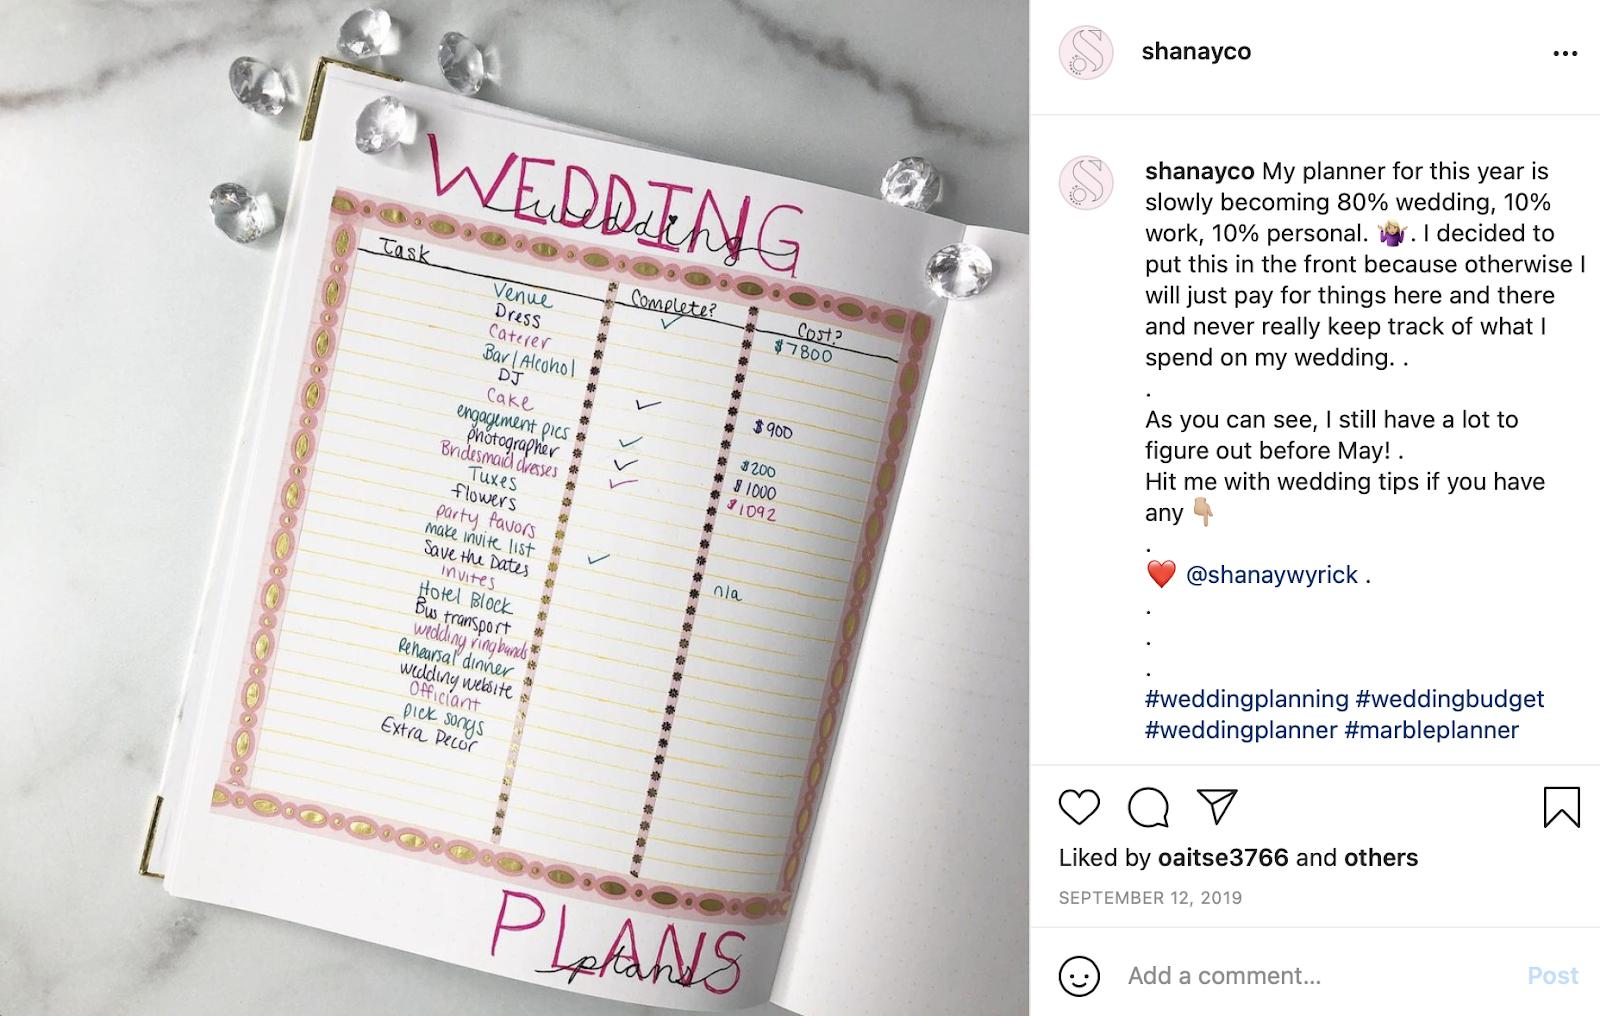 Shanayco wedding costs